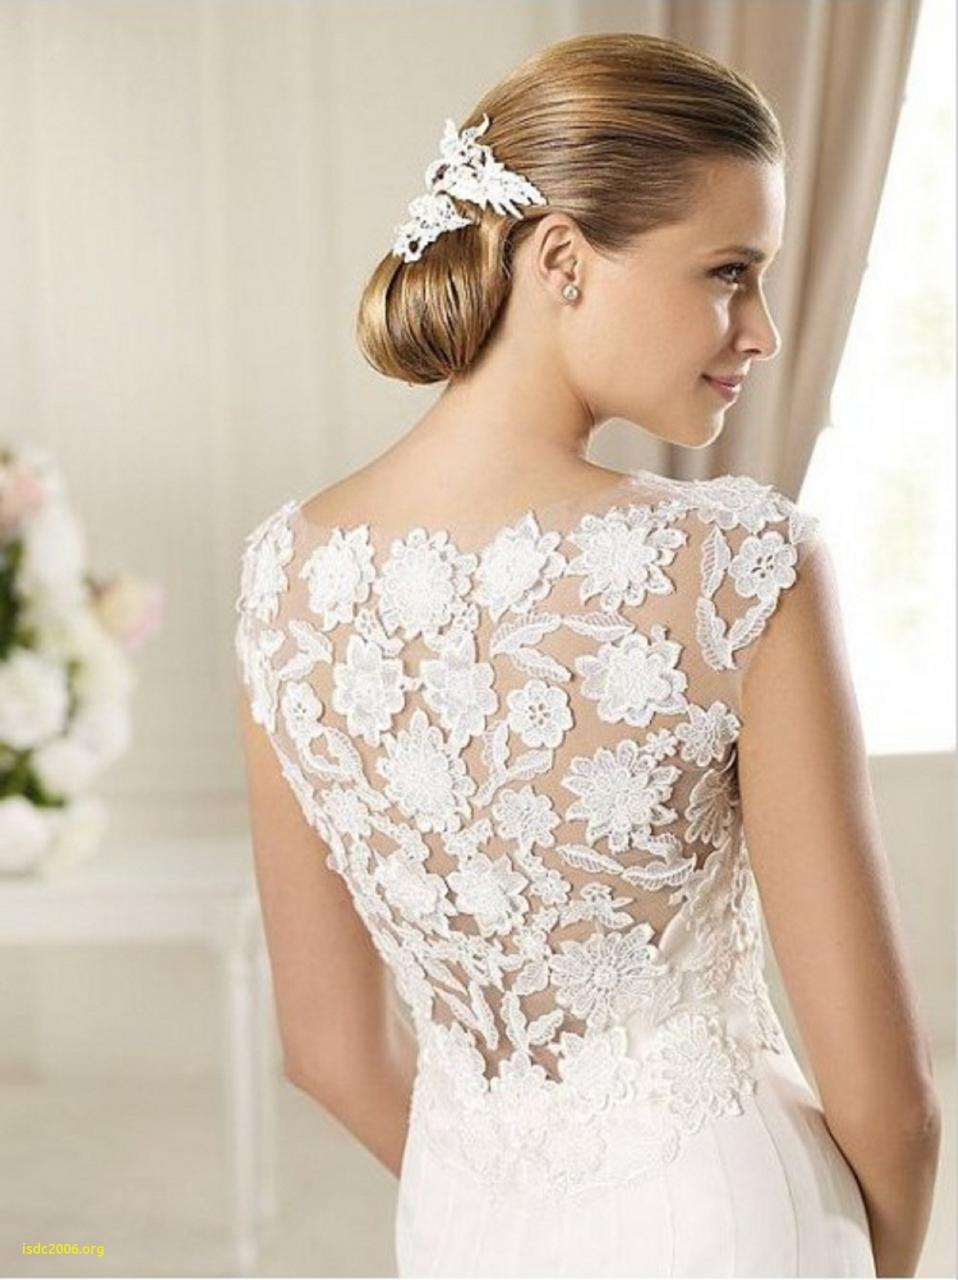 Vintage Wedding Dress Wallpapers HD I HD